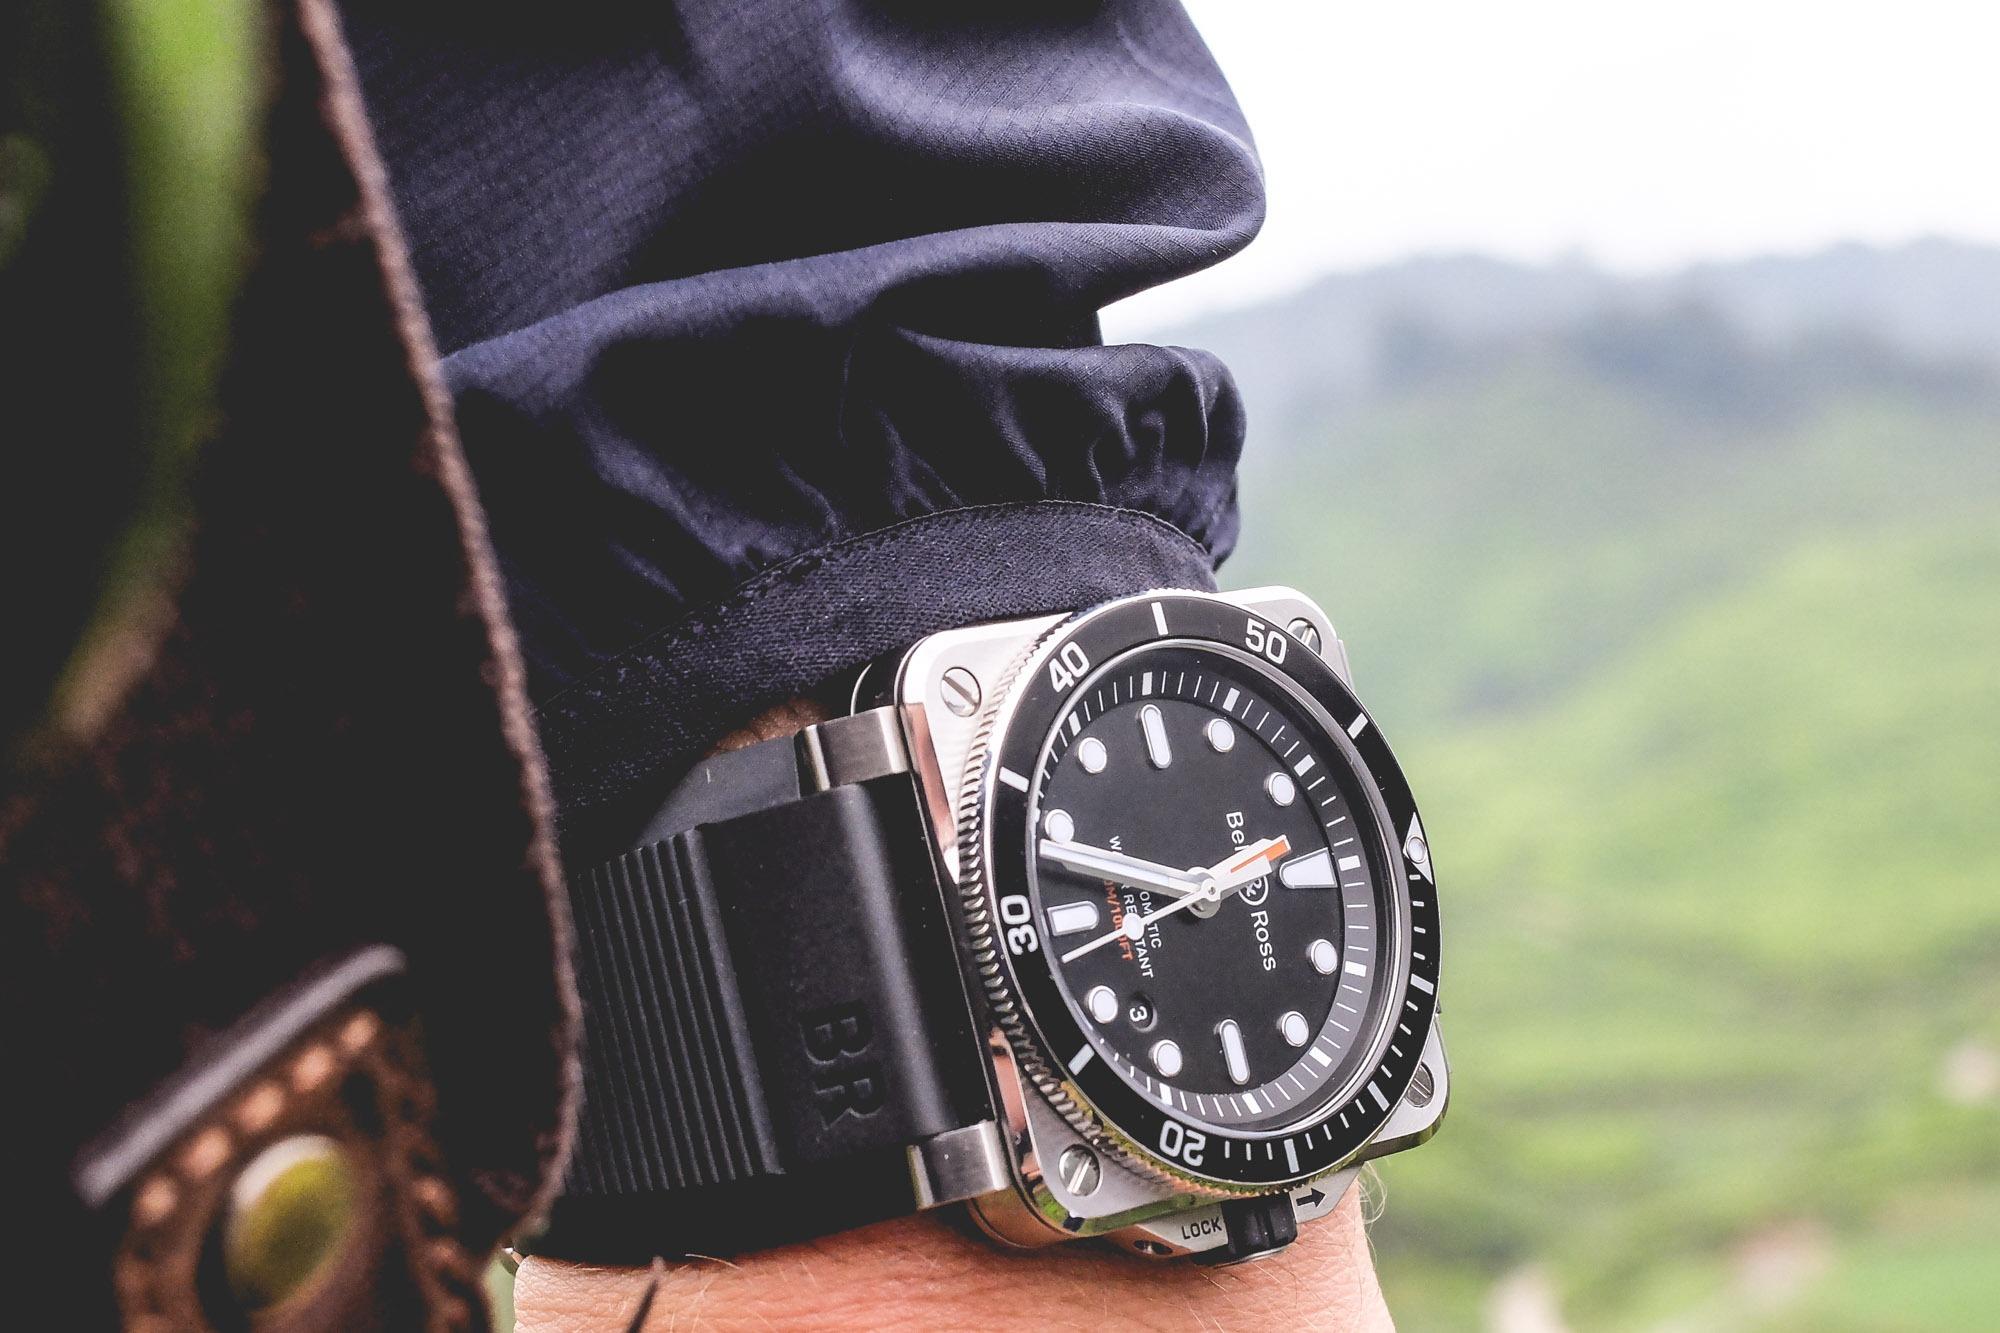 Bell & Ross - BR03 Diver